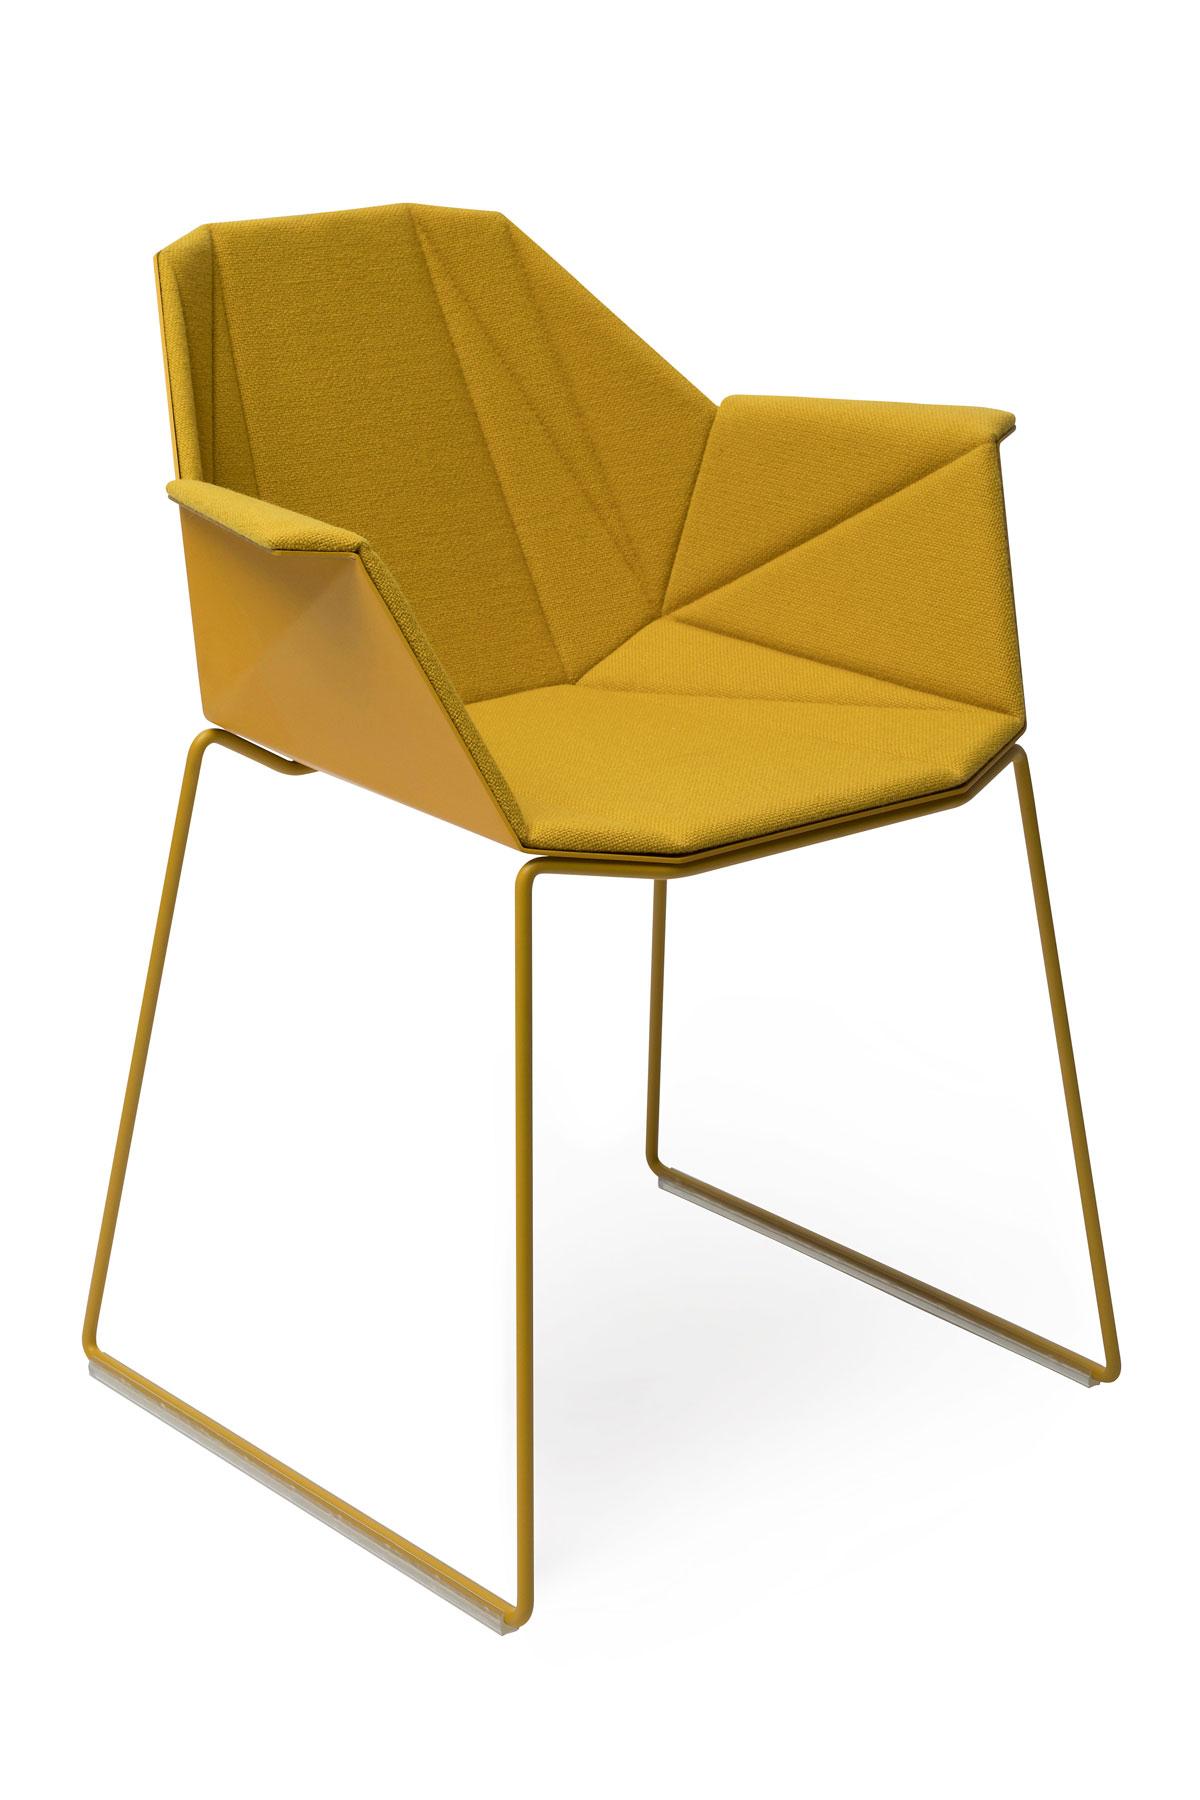 Alumni-Sledge-ochreous-yellow-upholstered_side-angle.jpg